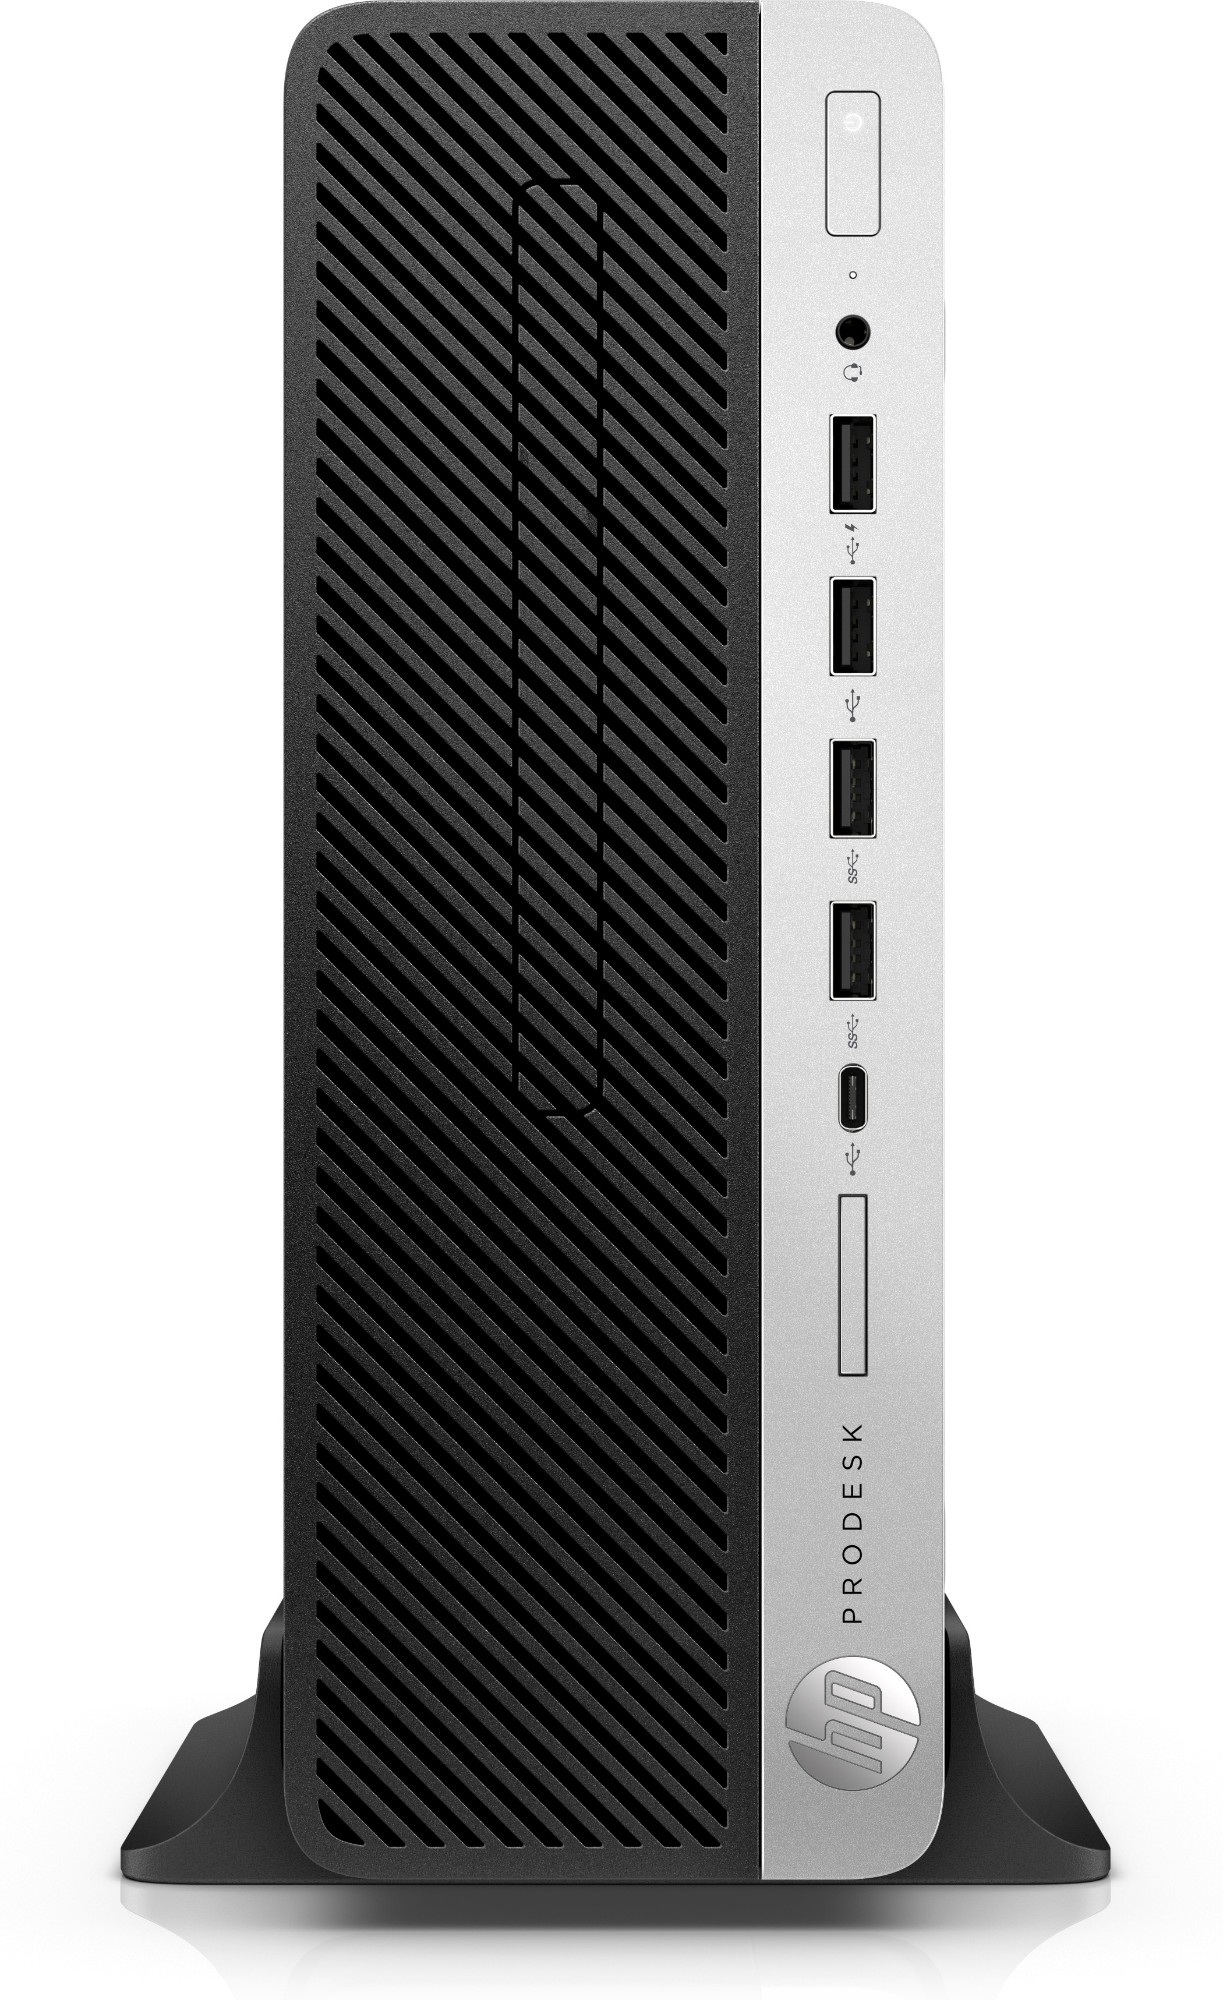 HP ProDesk 600 G3 6th gen Intel® Core™ i5 i5-6500 8 GB DDR4-SDRAM 256 GB SSD Black SFF PC